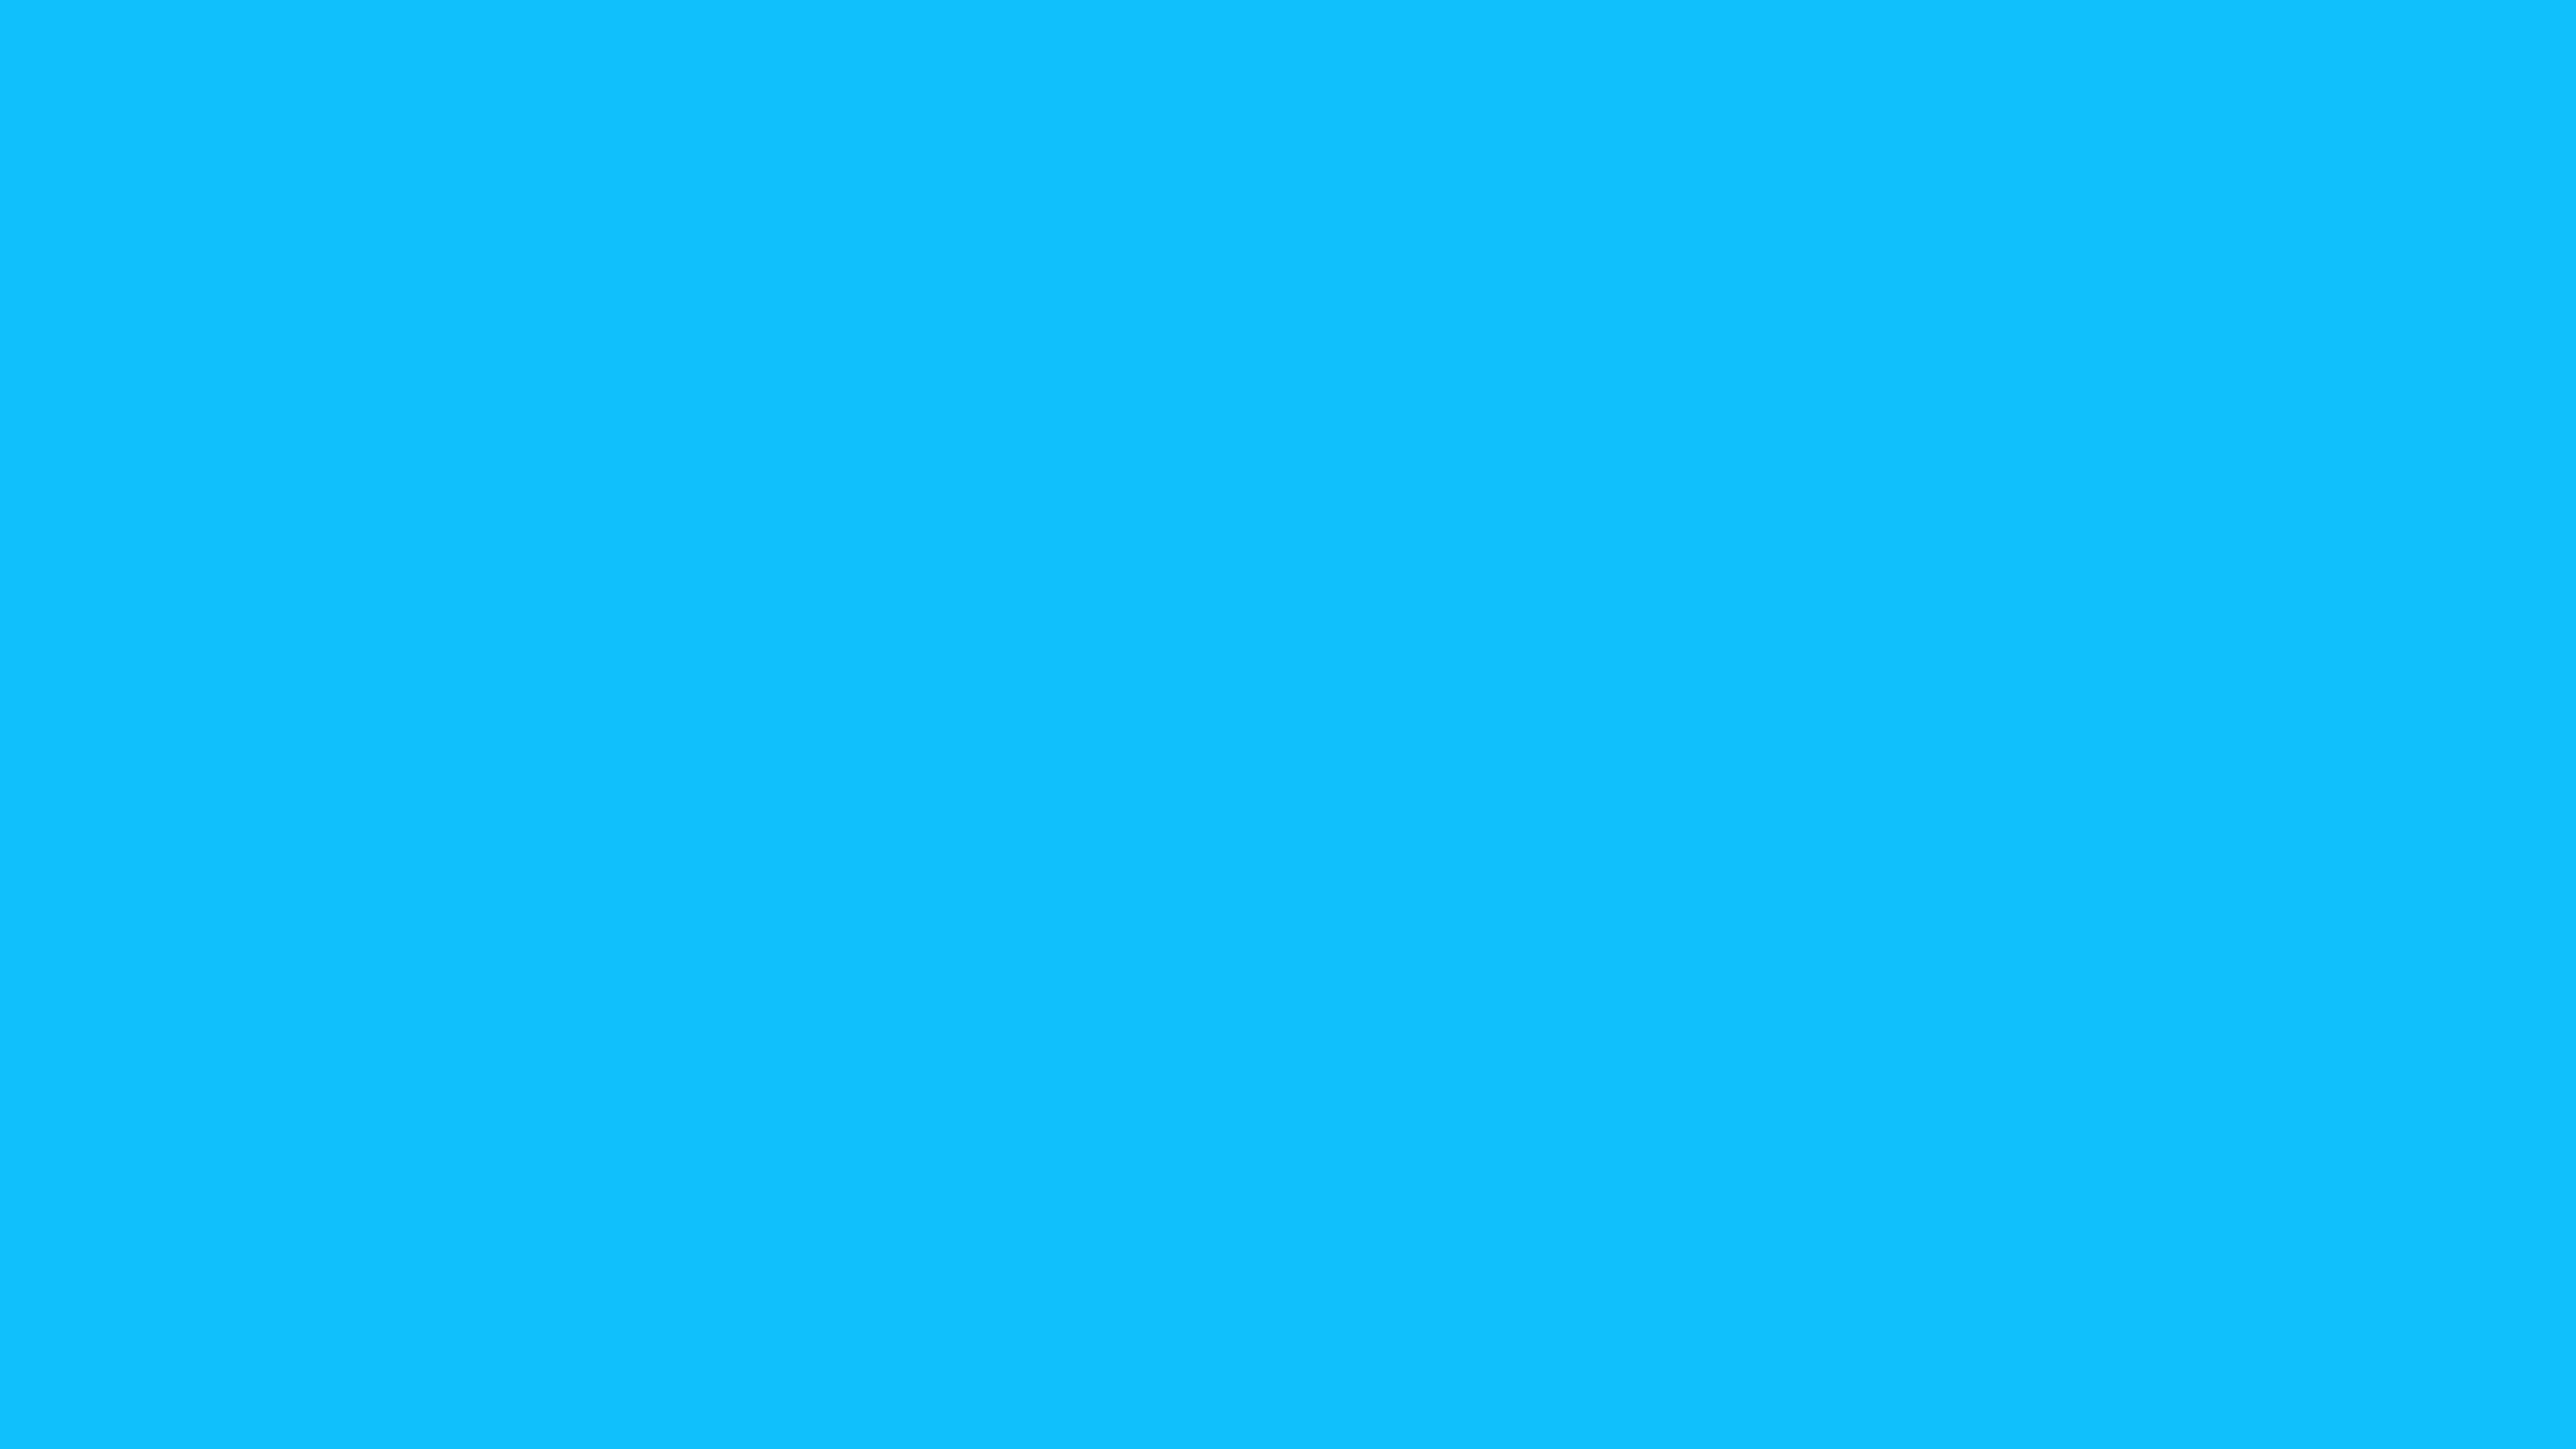 5120x2880 Spiro Disco Ball Solid Color Background